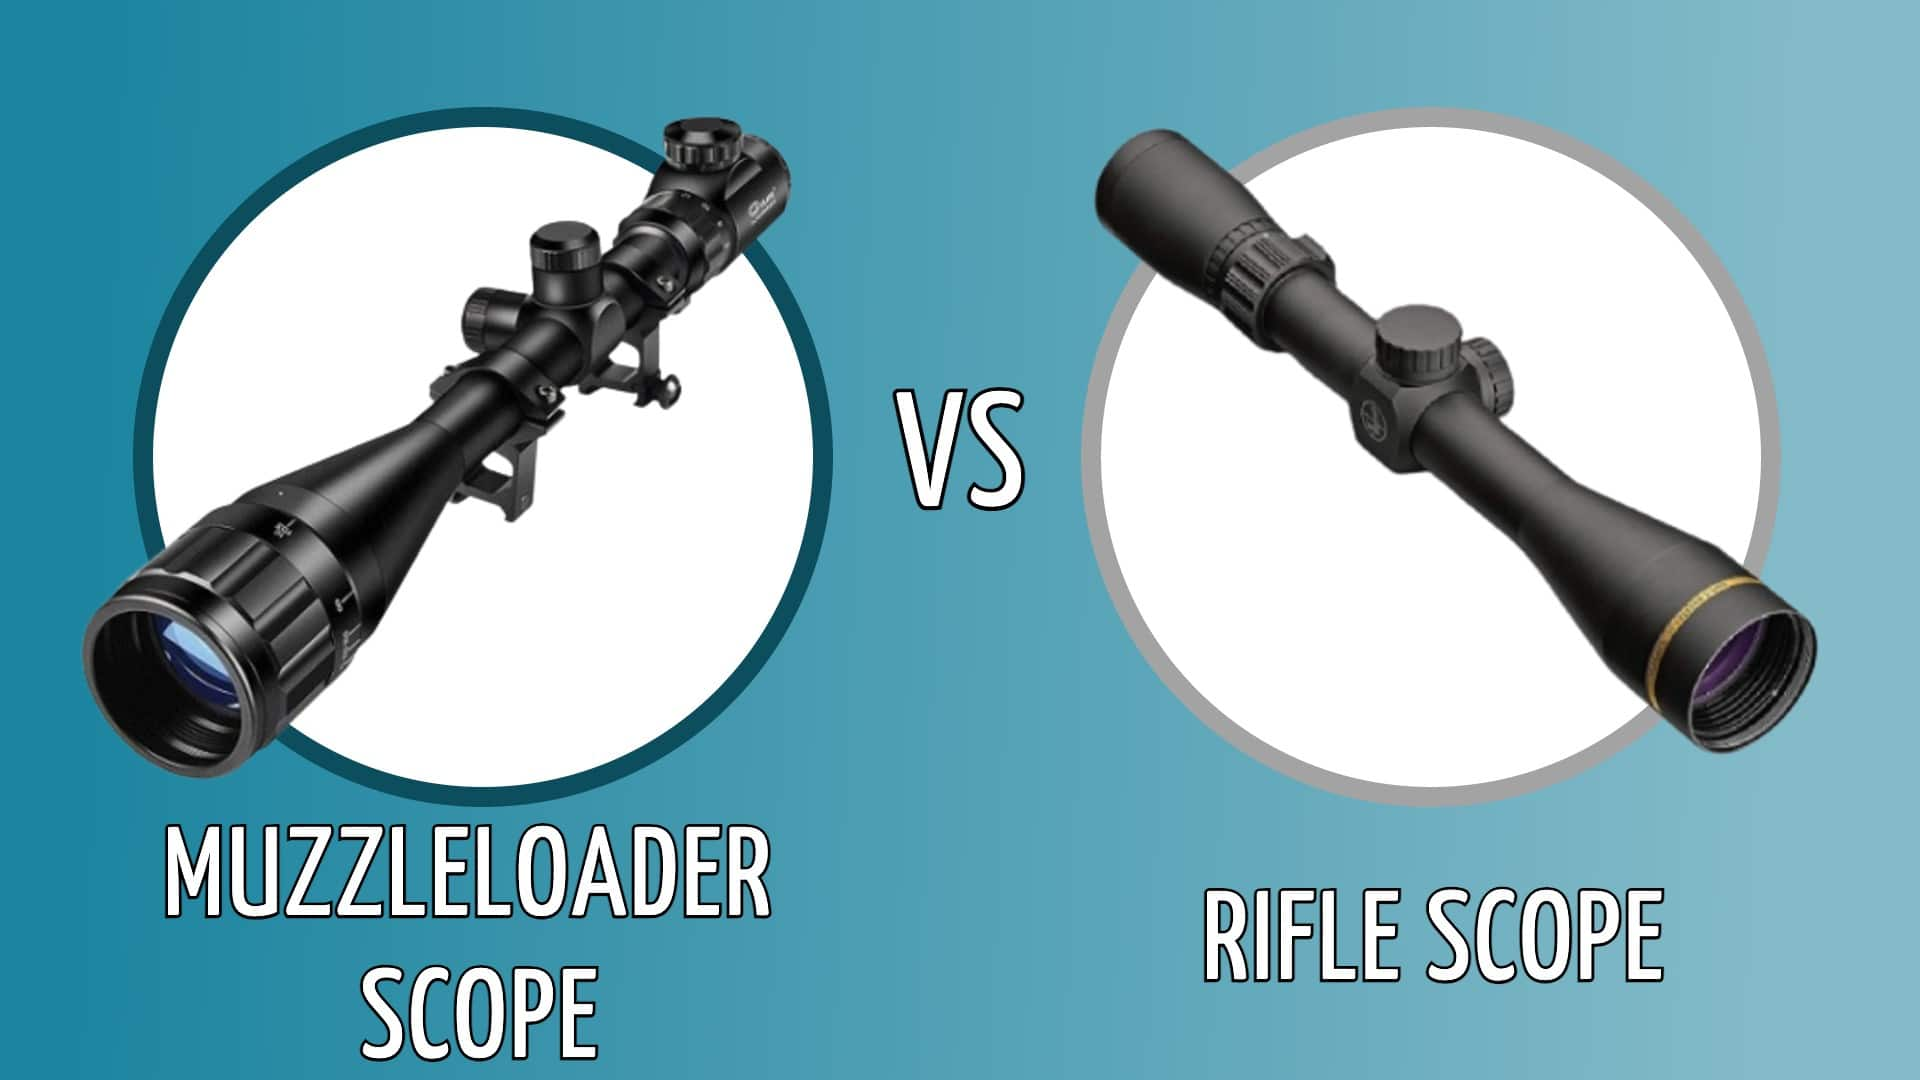 Muzzleloader scope vs rifle scope